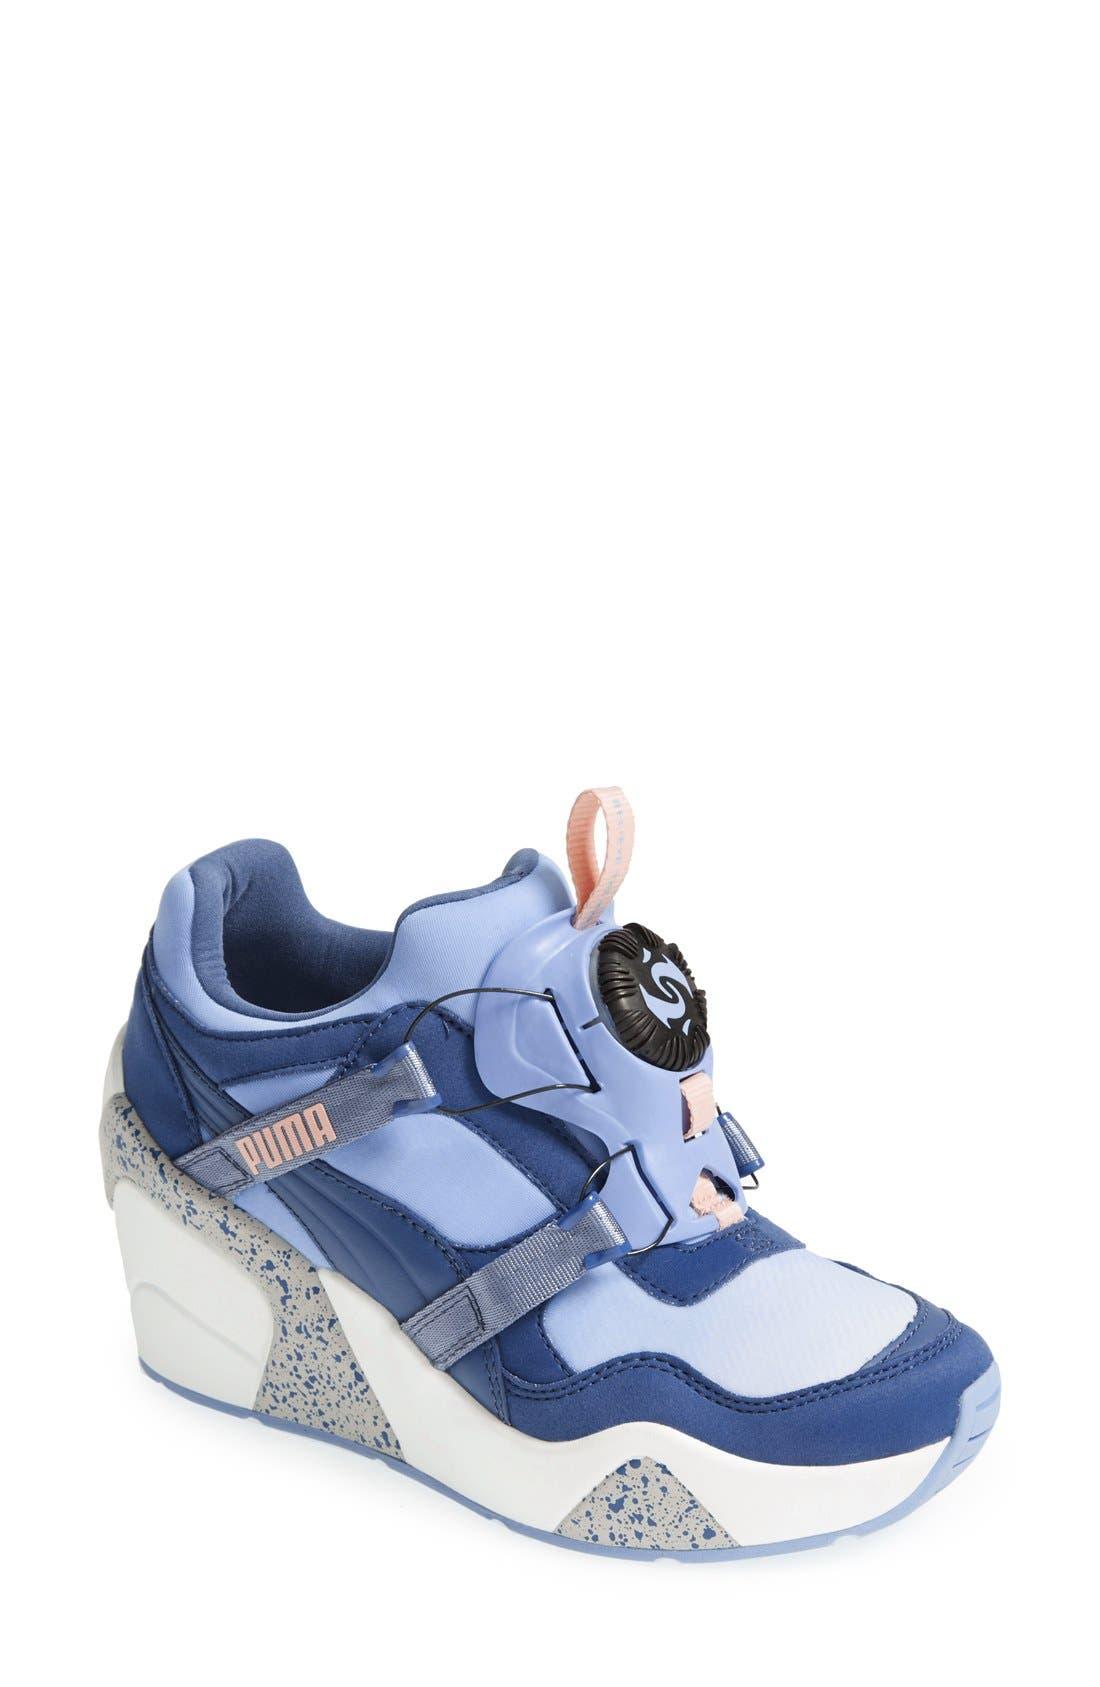 Main Image - PUMA 'Disc Trinomic - Sophia Chang' Wedge Sneaker (Women)